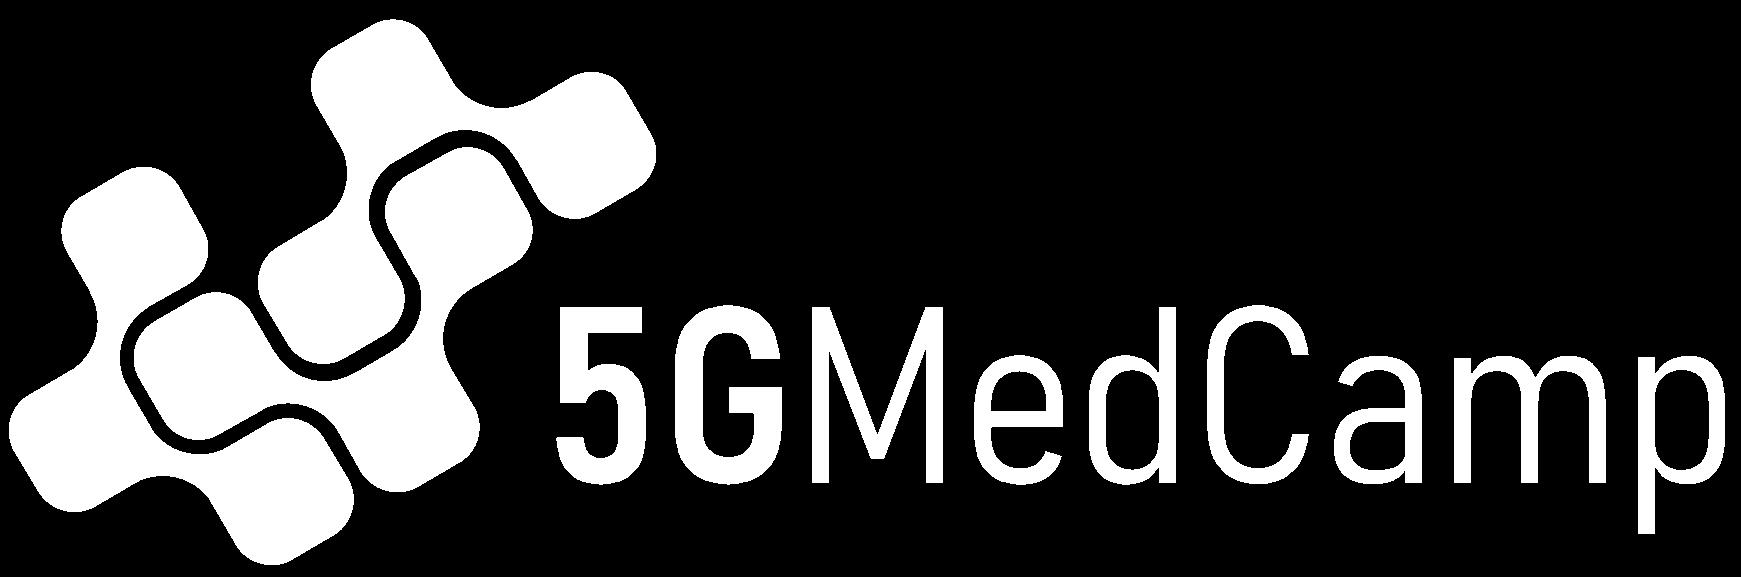 5GMedCamp